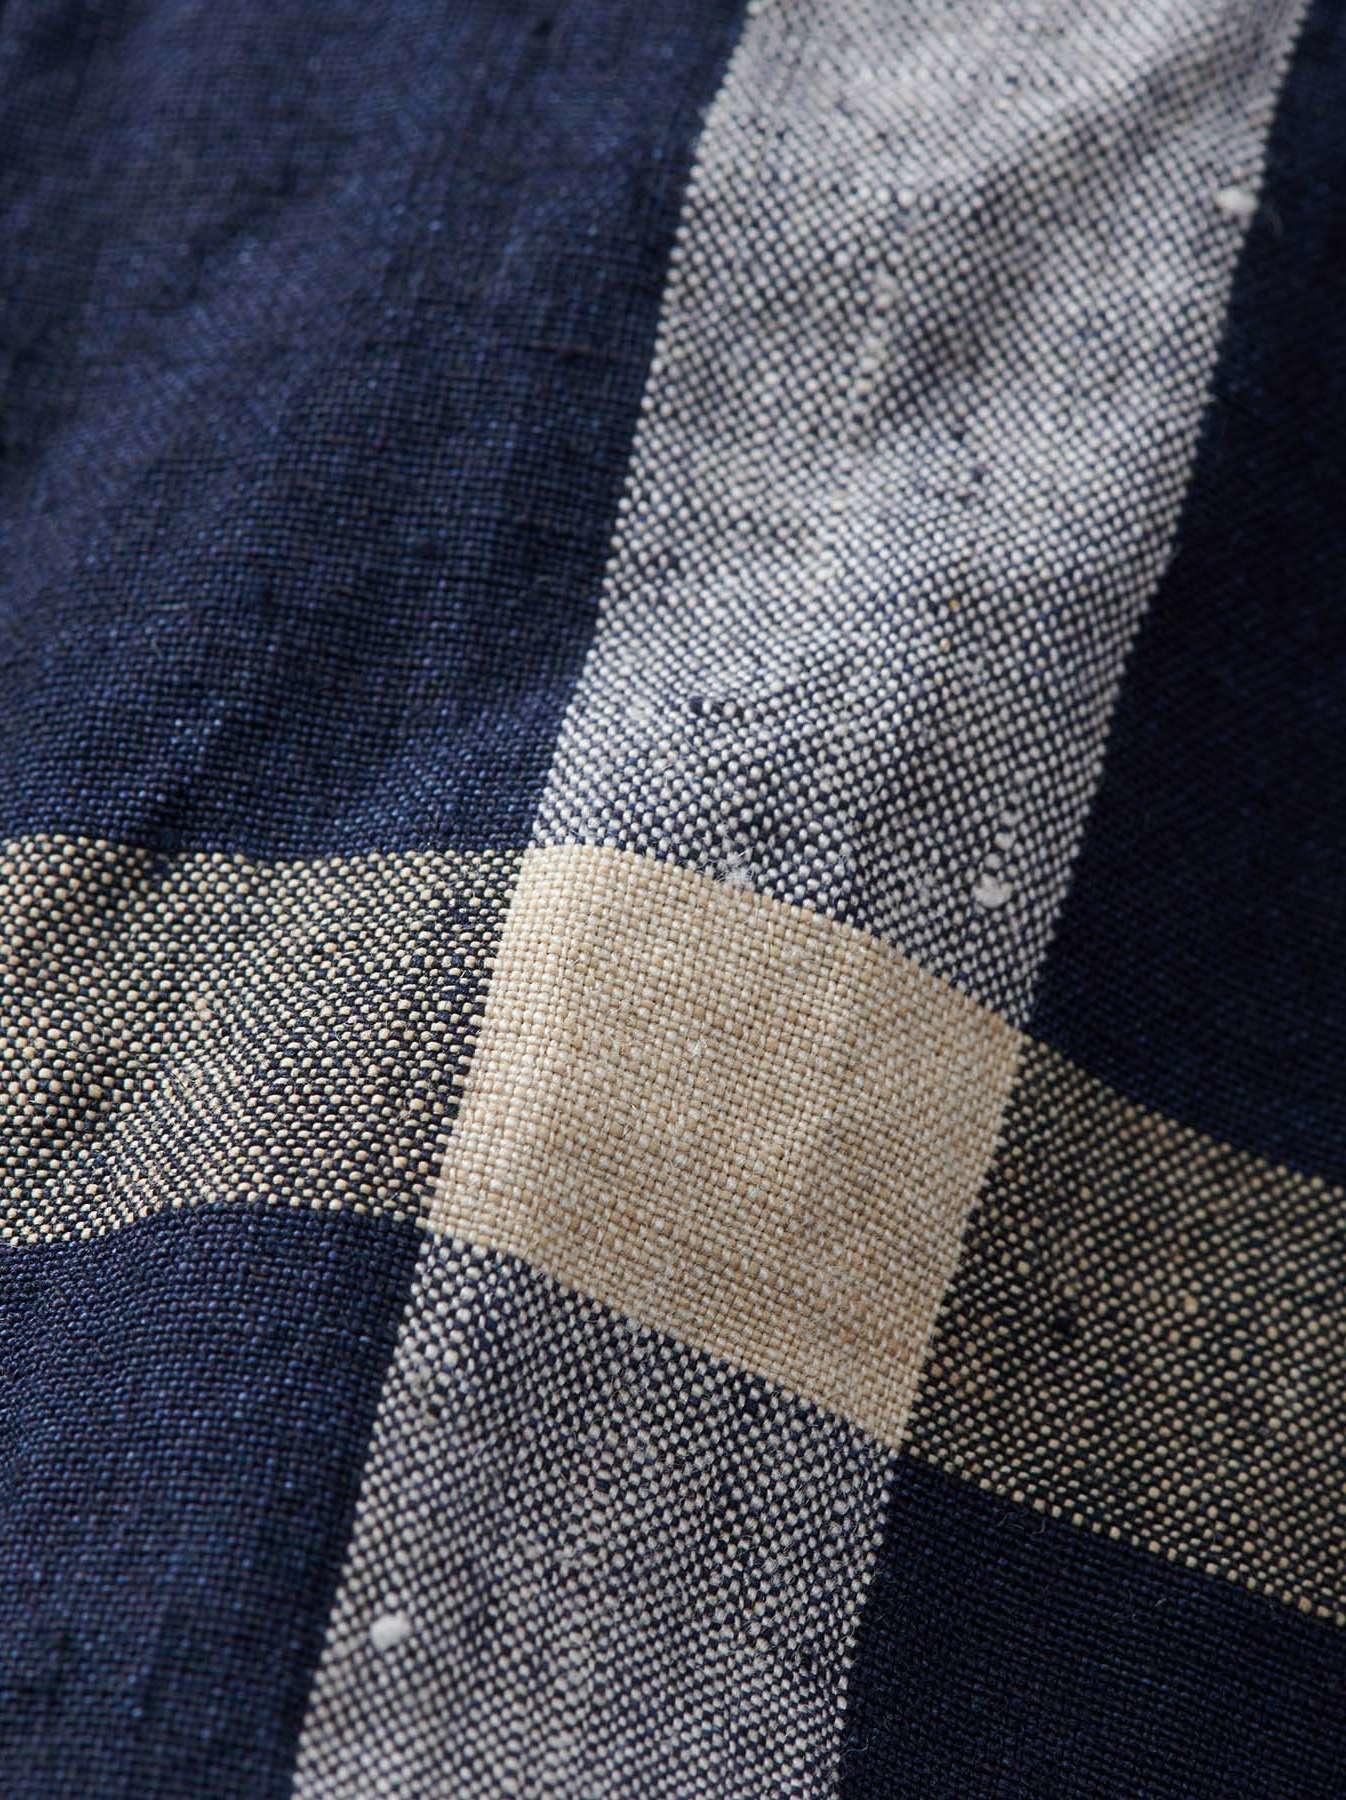 WH Linen 4545 Check Pants-12